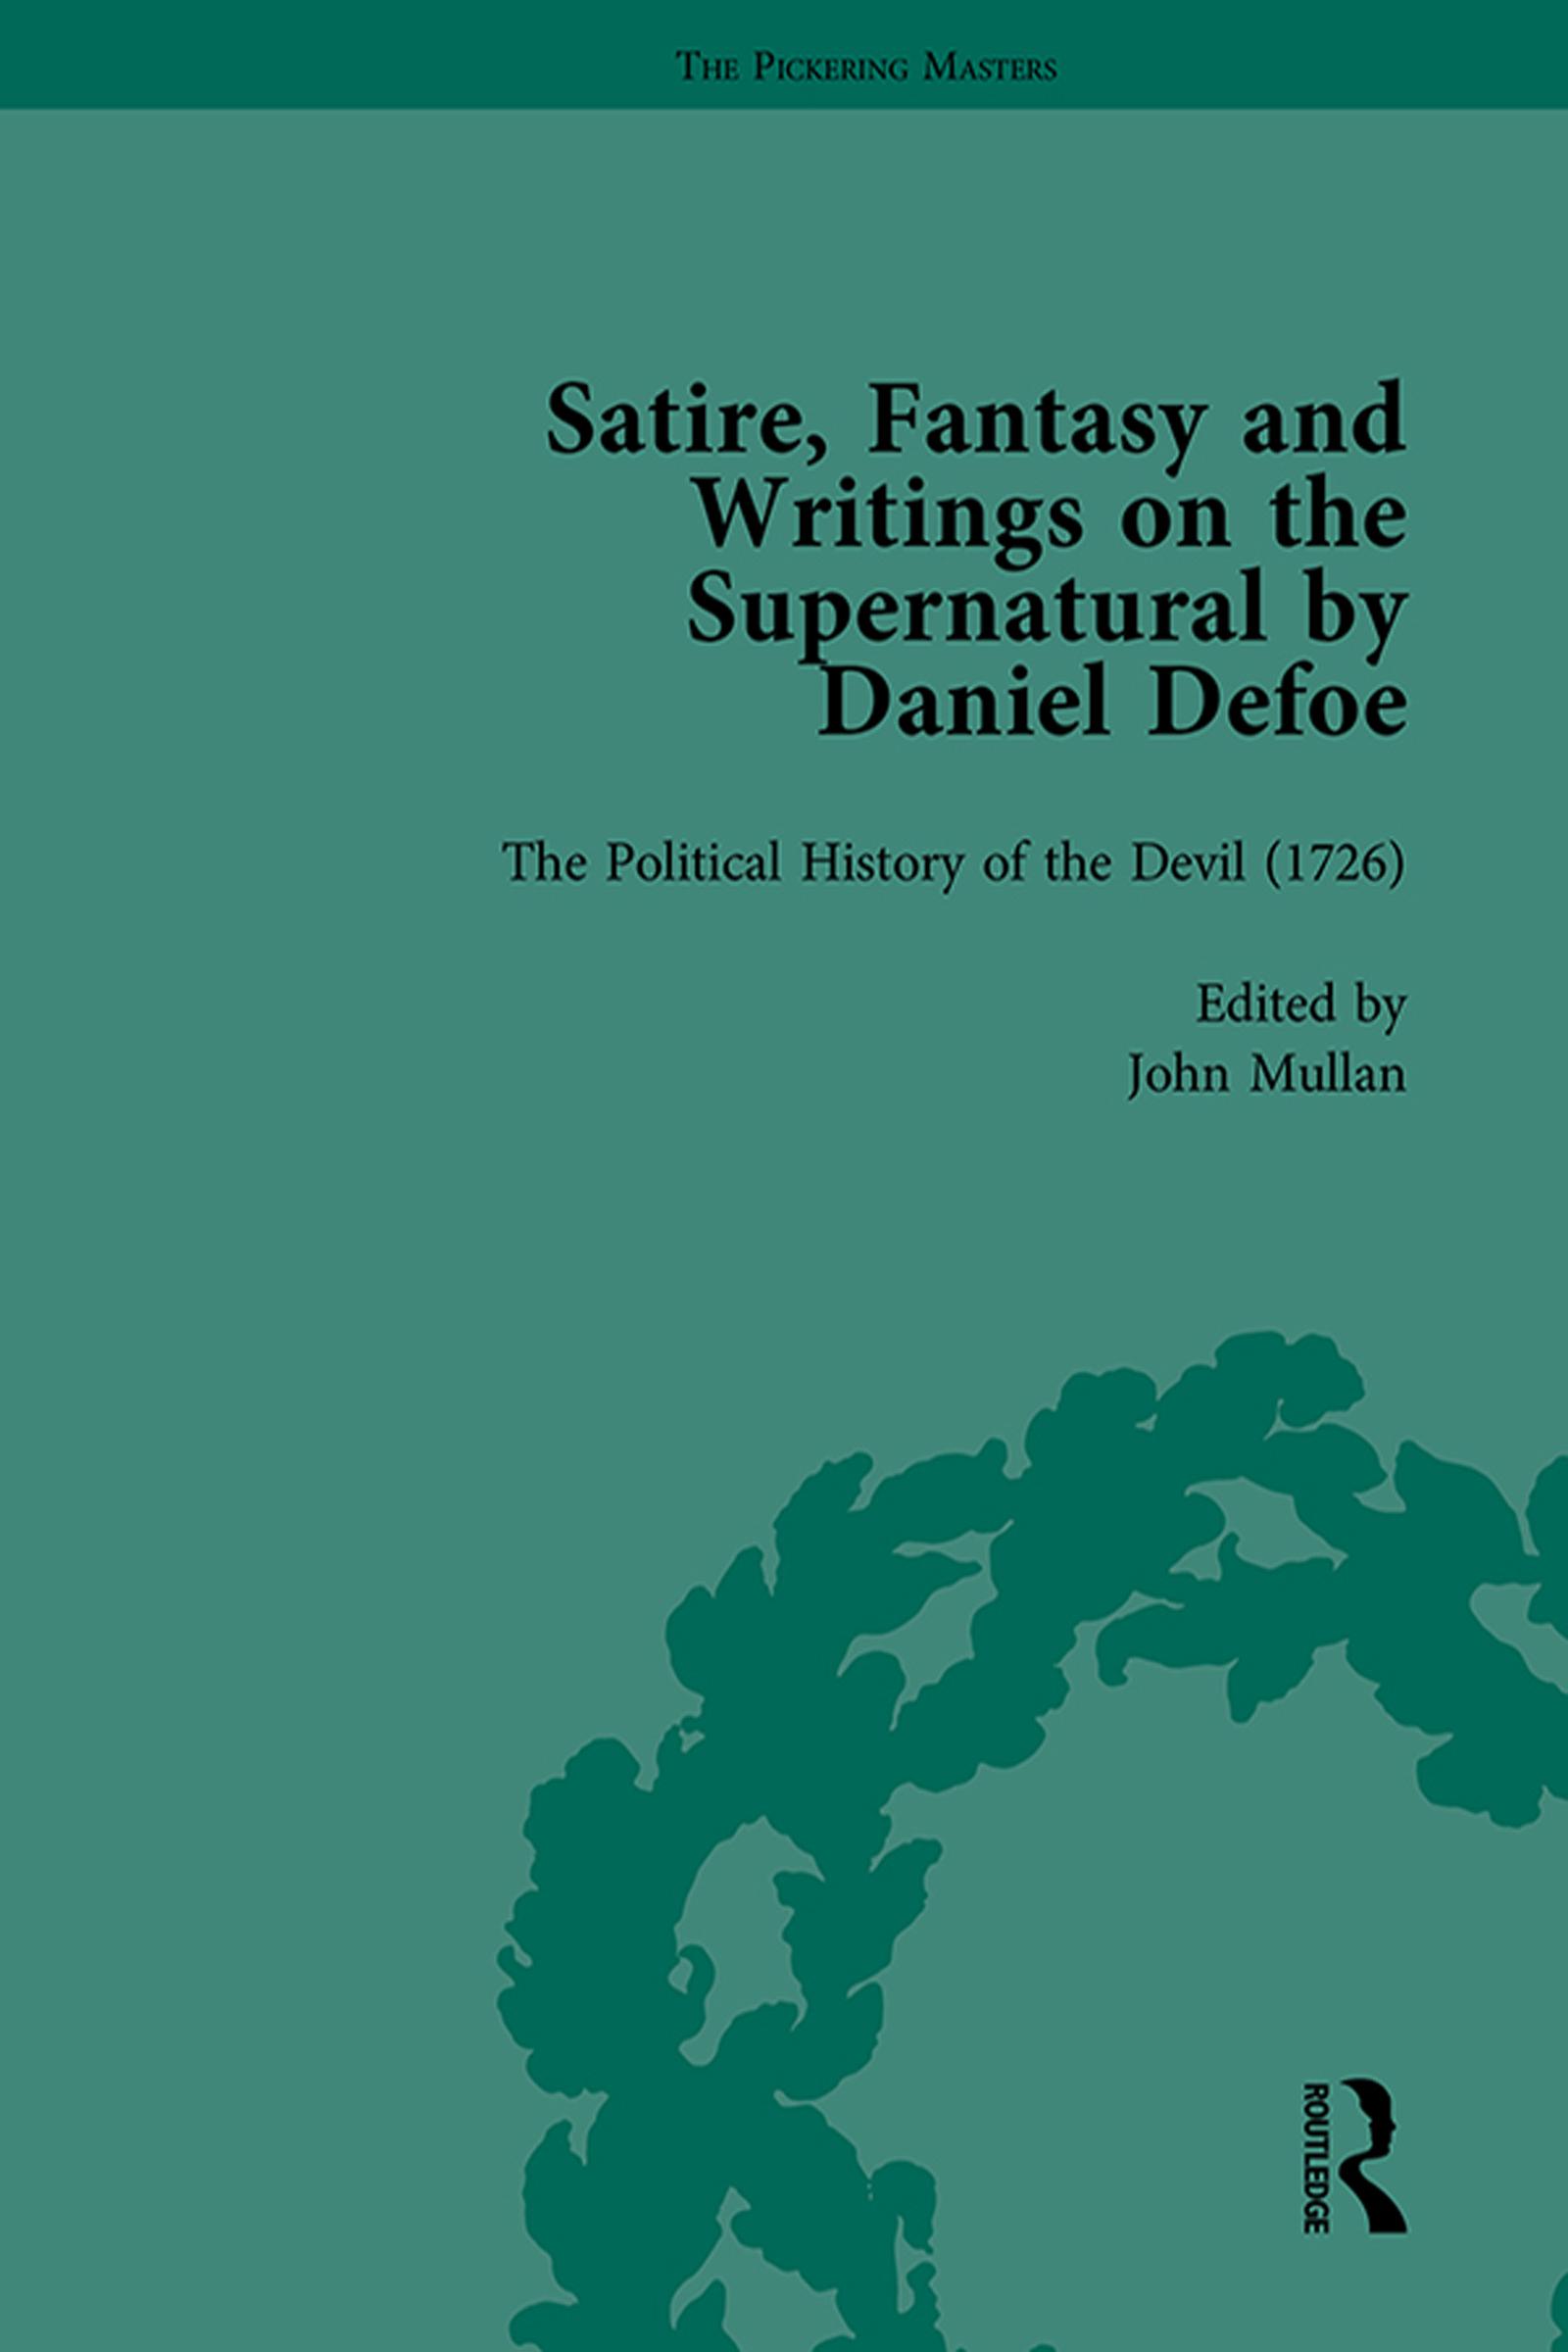 Satire, Fantasy and Writings on the Supernatural by Daniel Defoe, Part II vol 6